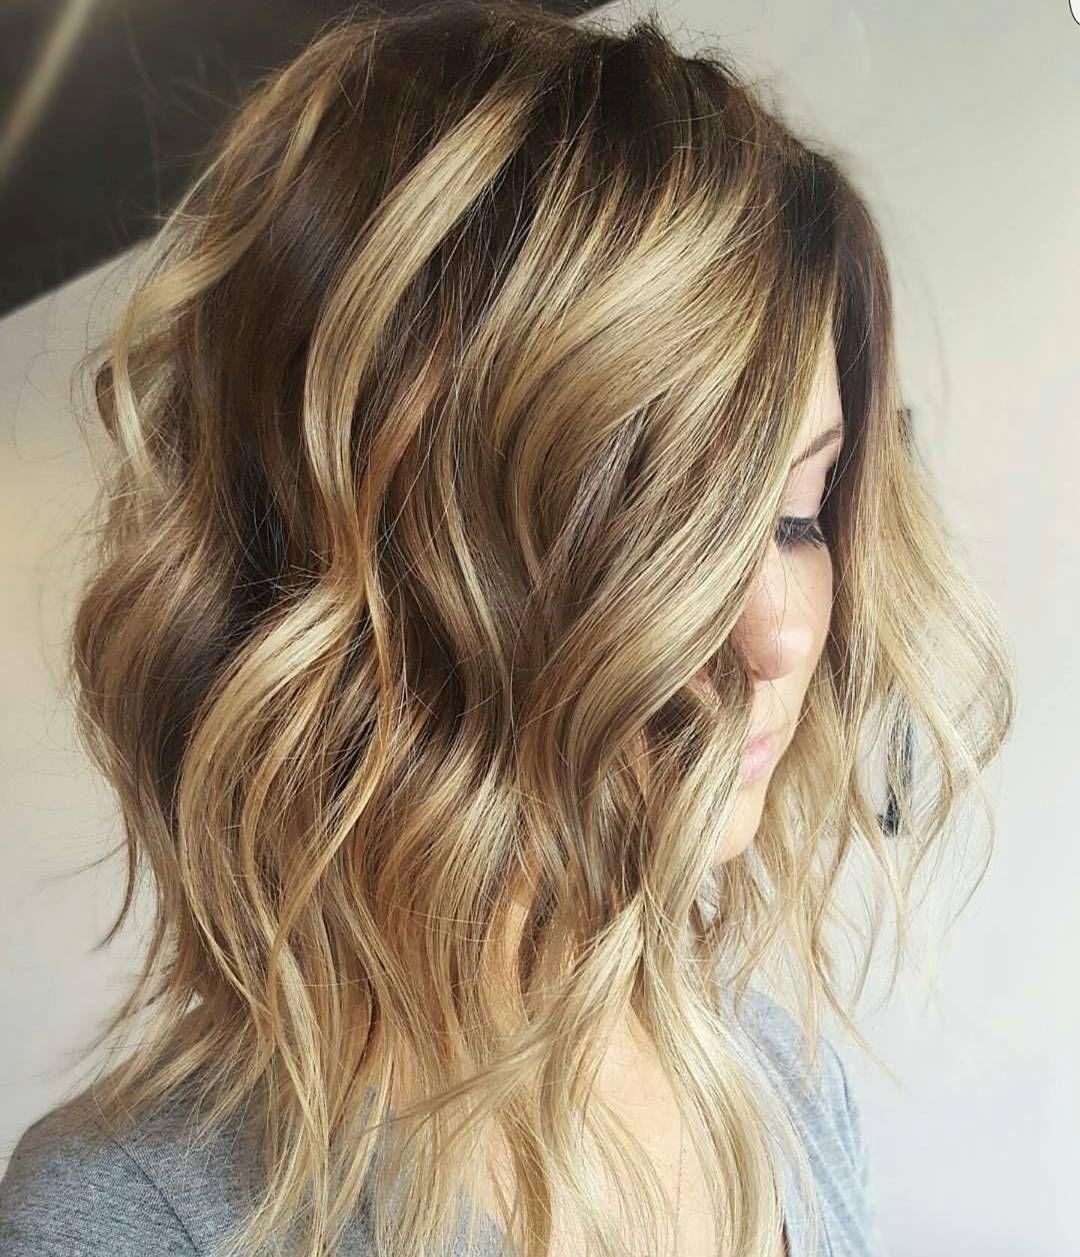 See This Instagram Photo By Behindthechair Com 6 262 Likes Hair Styles Medium Length Hair Styles Short Wavy Hair